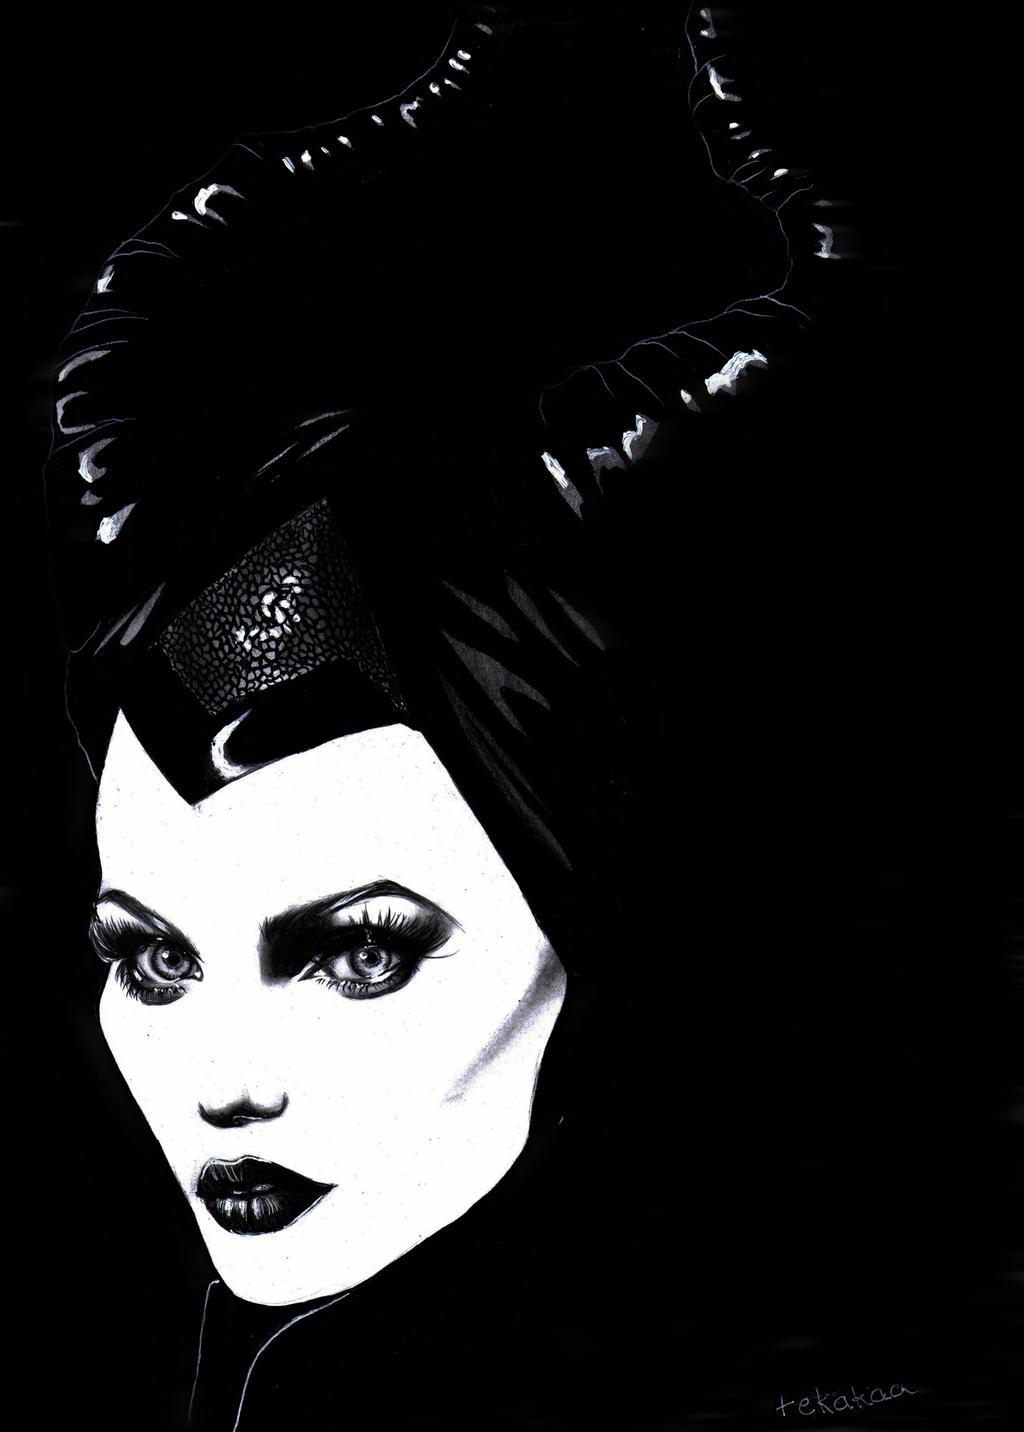 (Pencil drawing) Maleficent by LinaKaye on DeviantArt